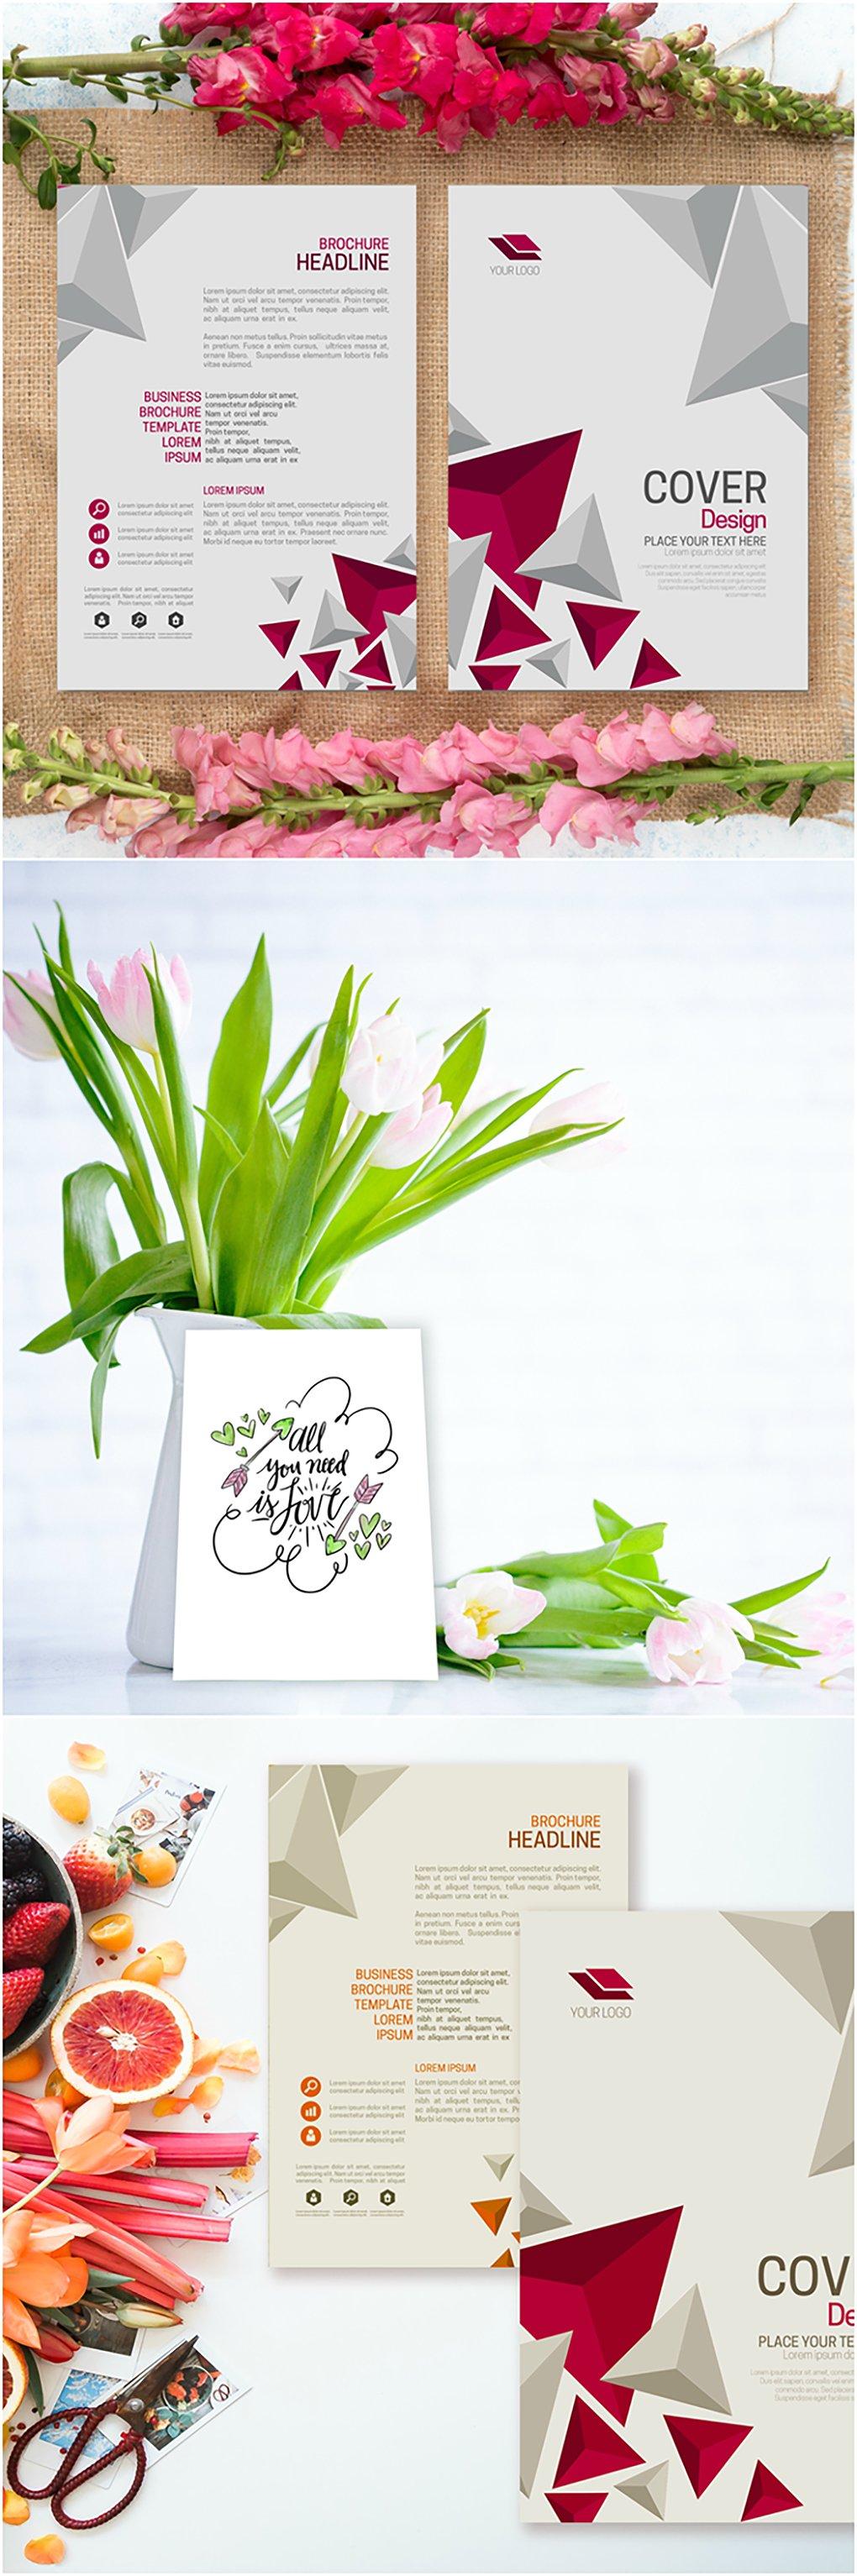 Easter & Spring Bundle - $15 - preview image 4